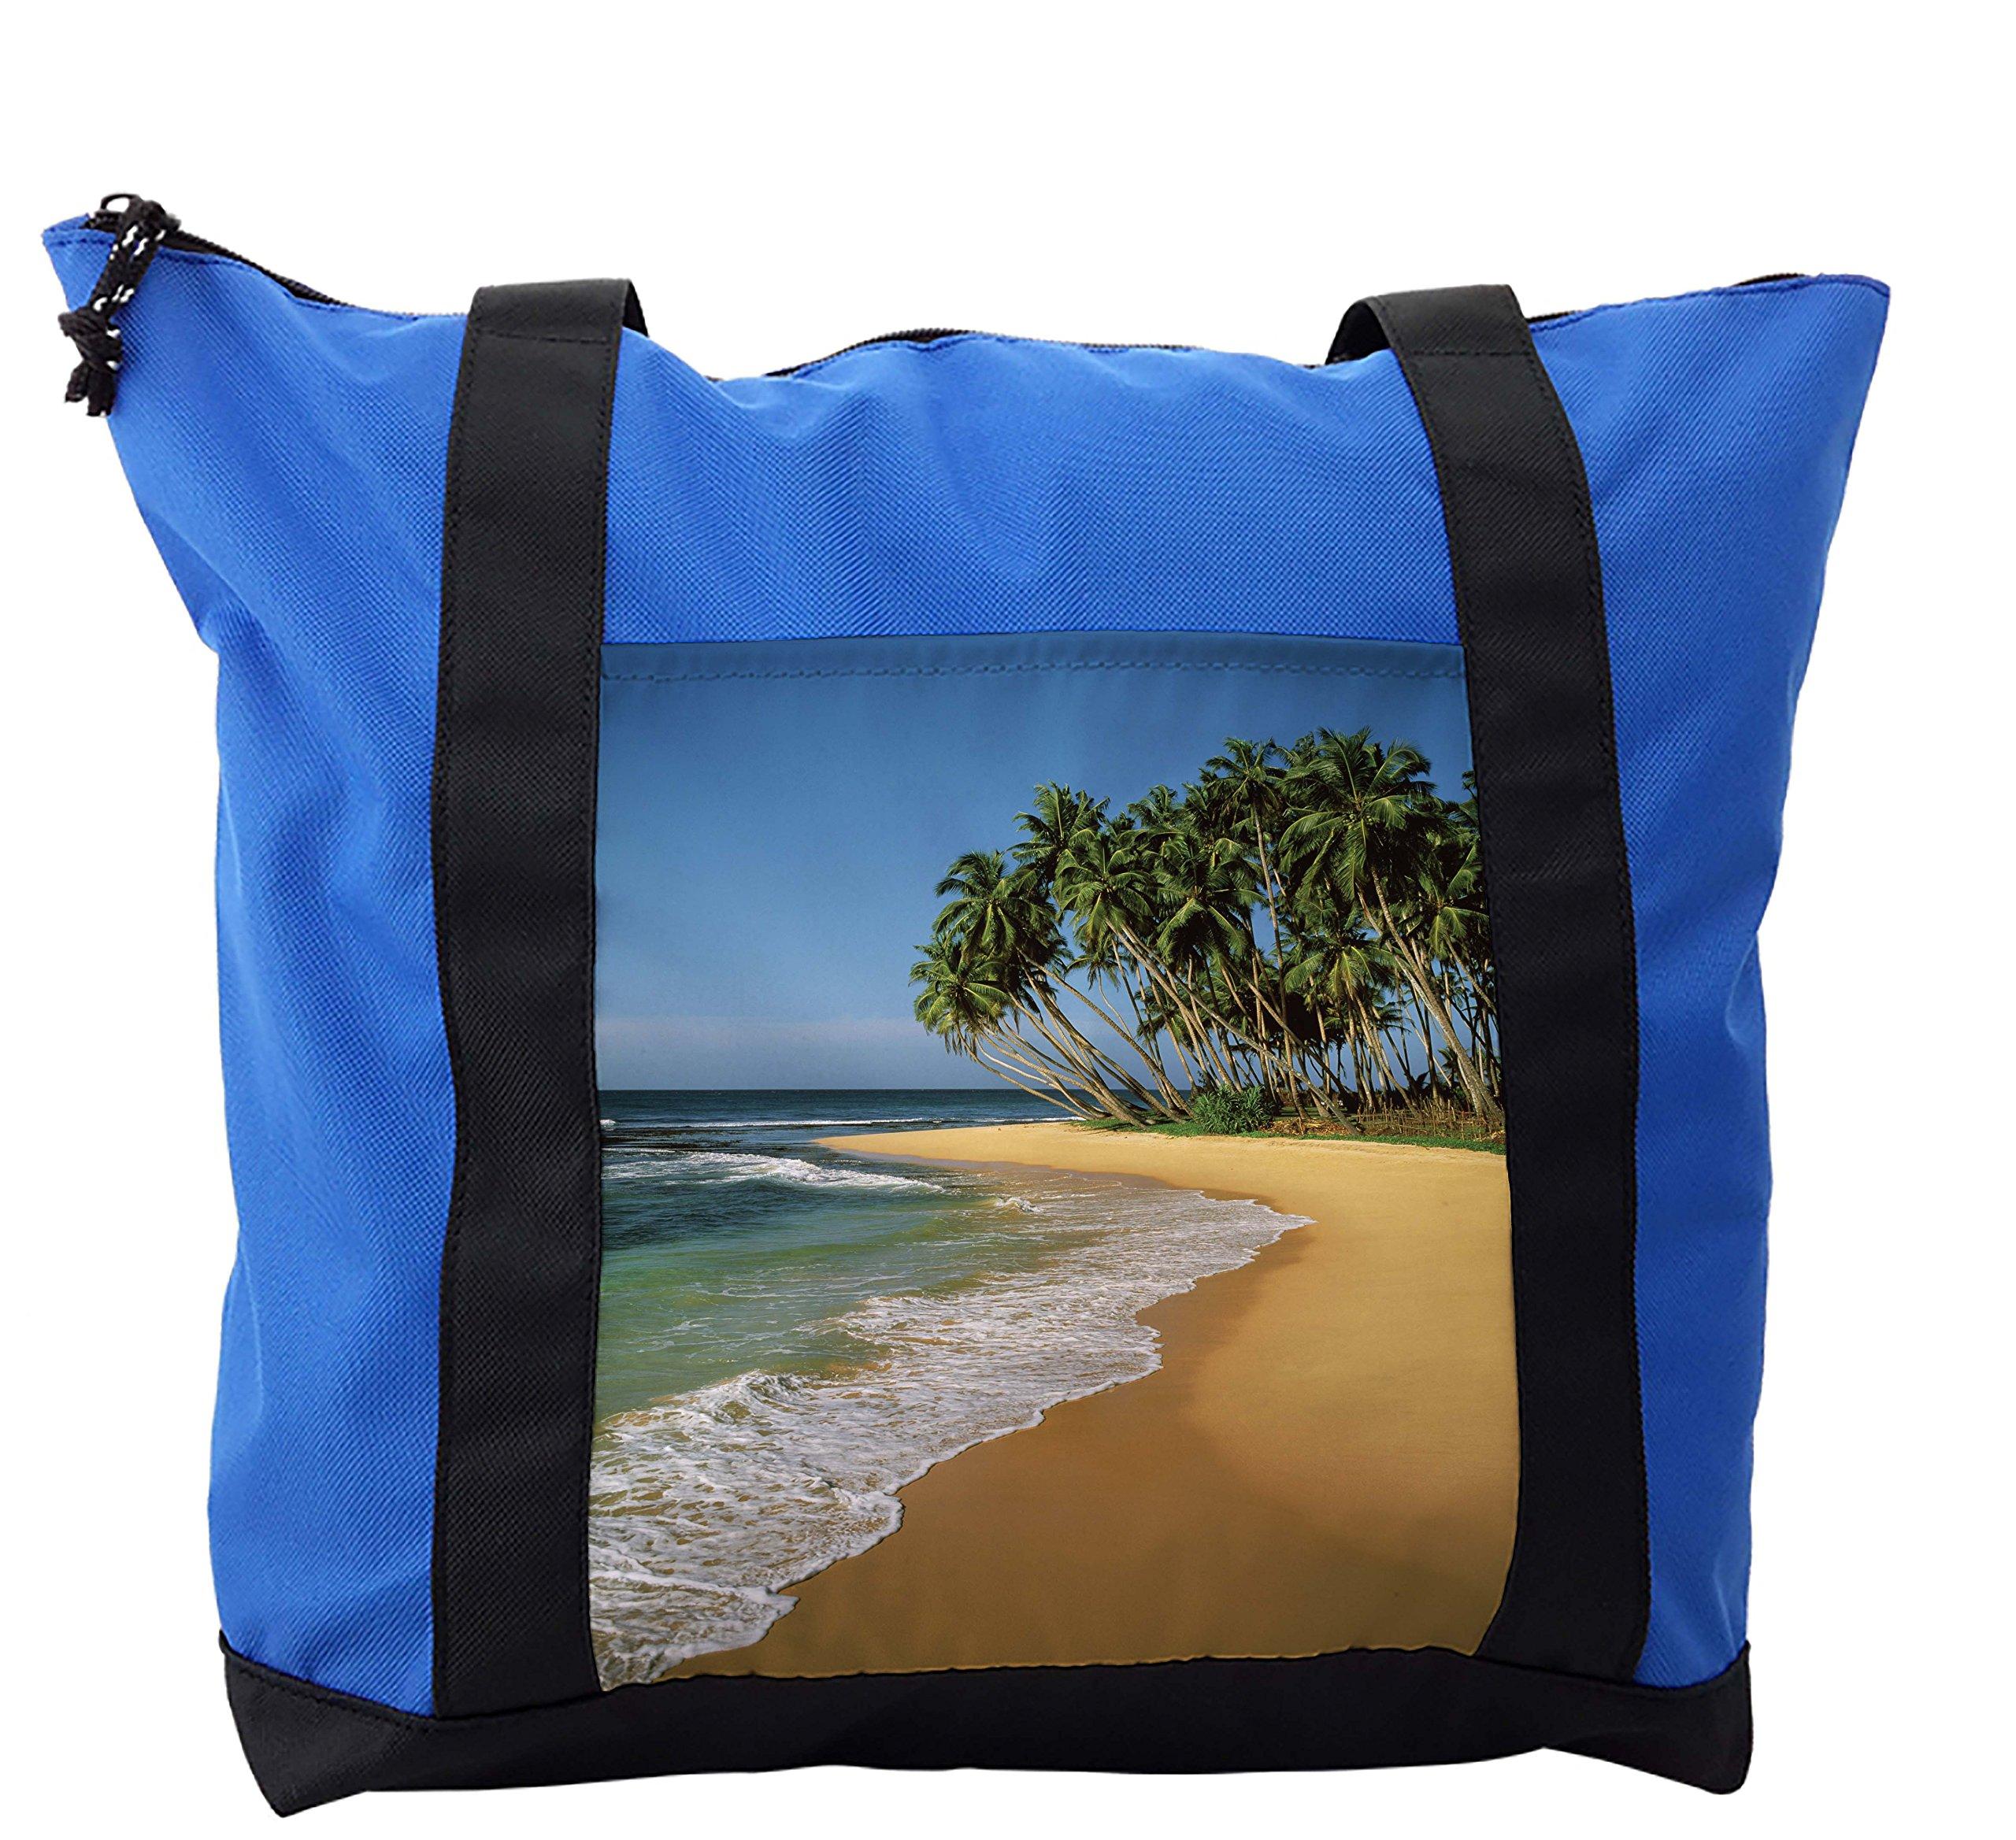 Lunarable Beach Shoulder Bag, Tropic Beach with Palm Trees, Durable with Zipper